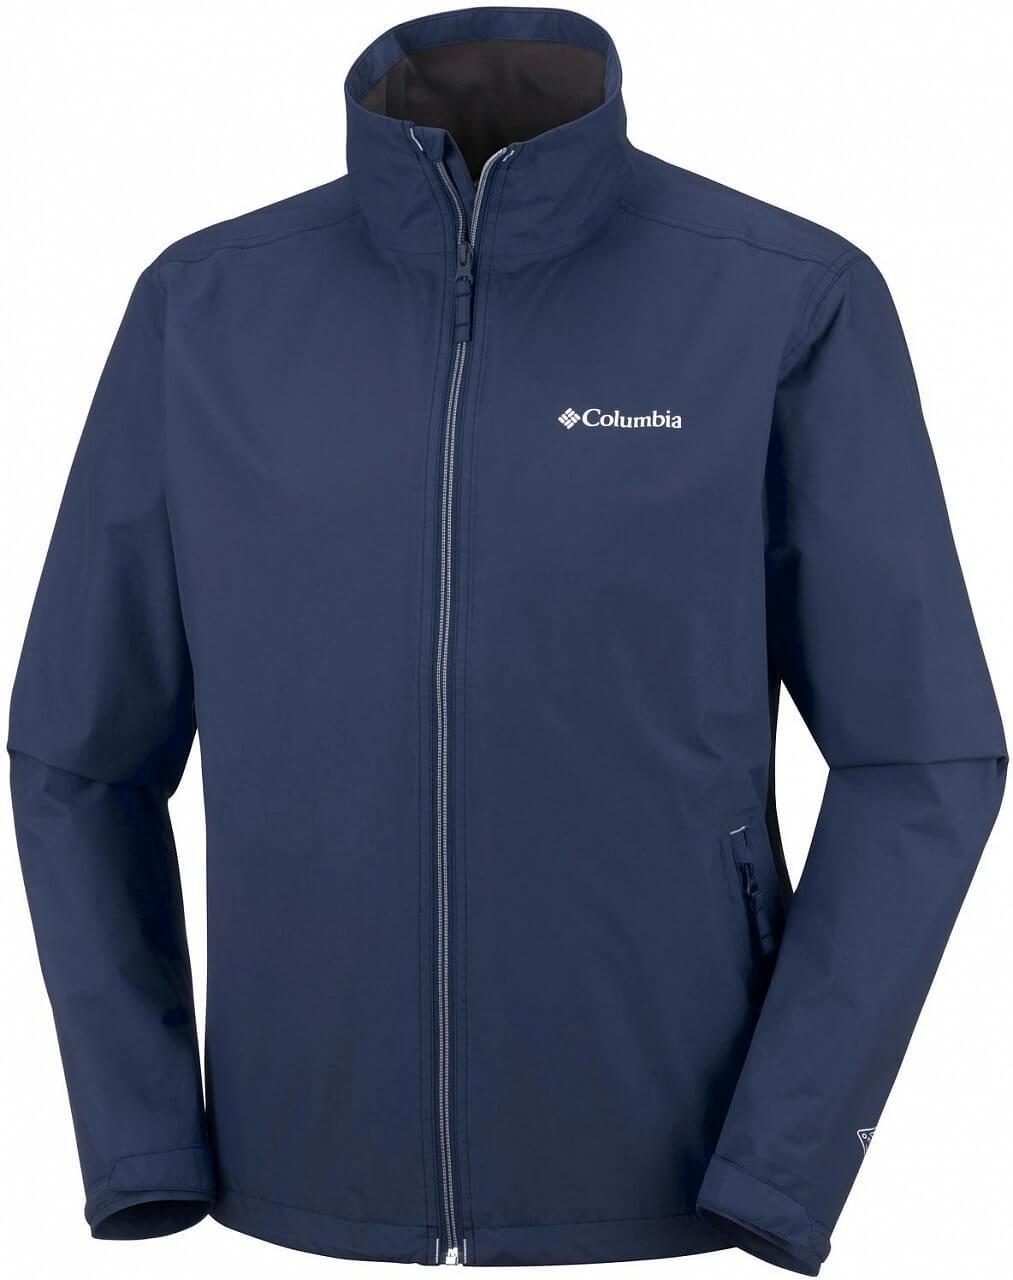 Pánská bunda Columbia Bradley Peak Jacket